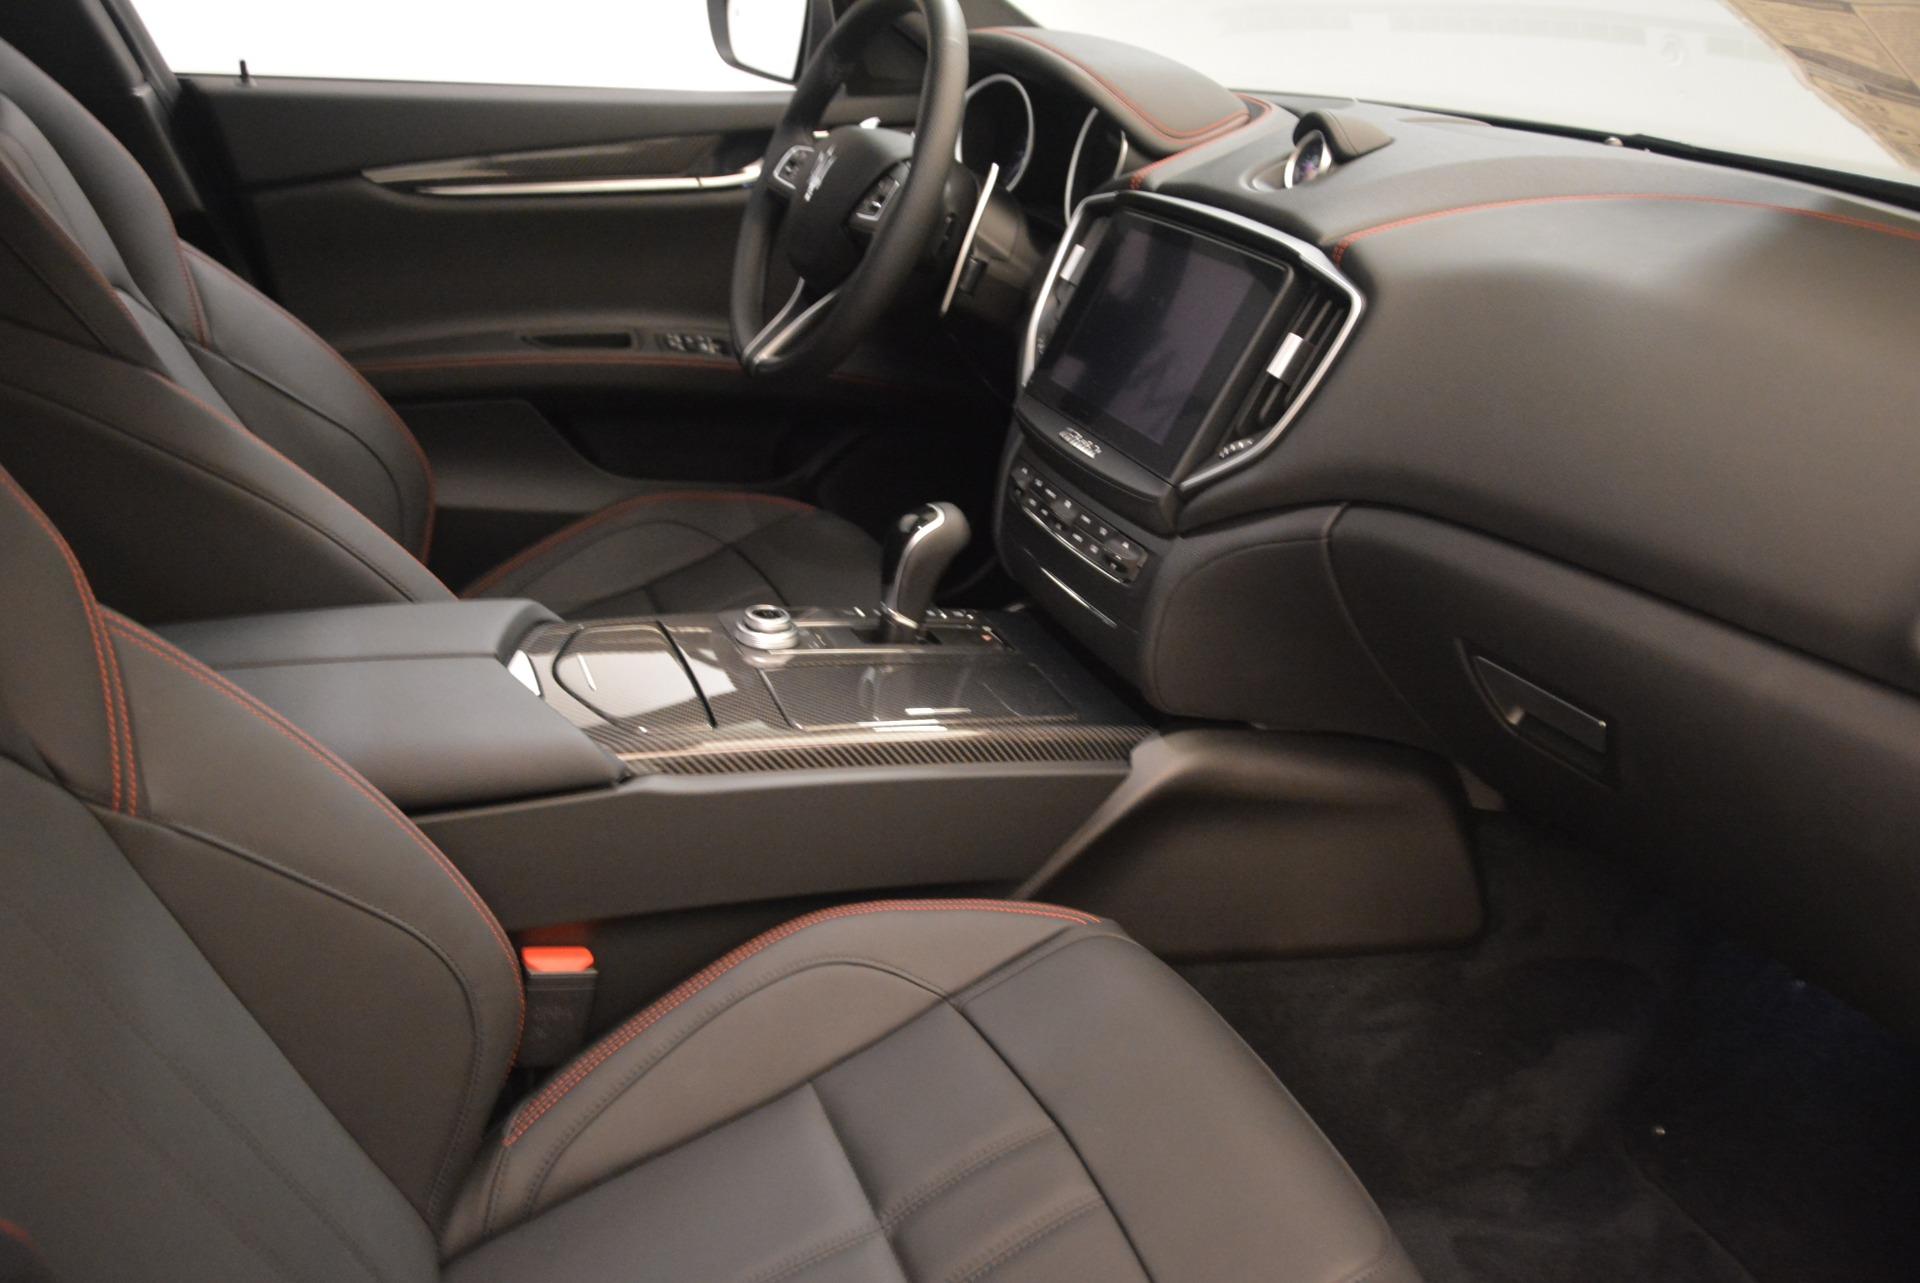 New 2018 Maserati Ghibli SQ4 GranSport Nerissimo For Sale In Westport, CT 2366_p16